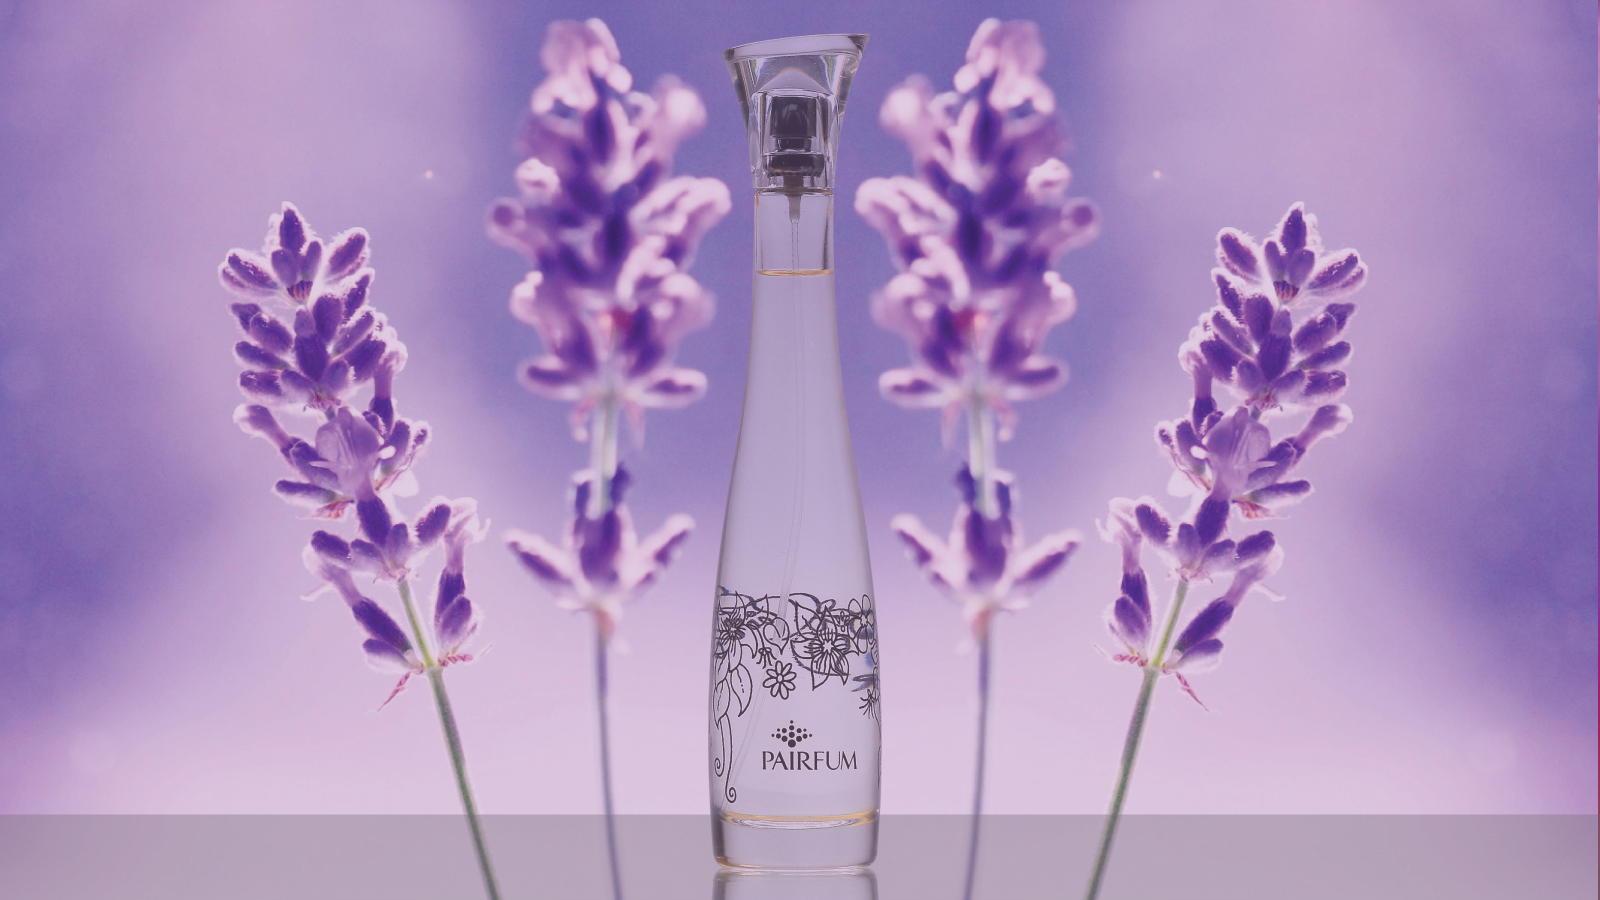 Flacon Room Perfume Spray Lavender Flower 16 9